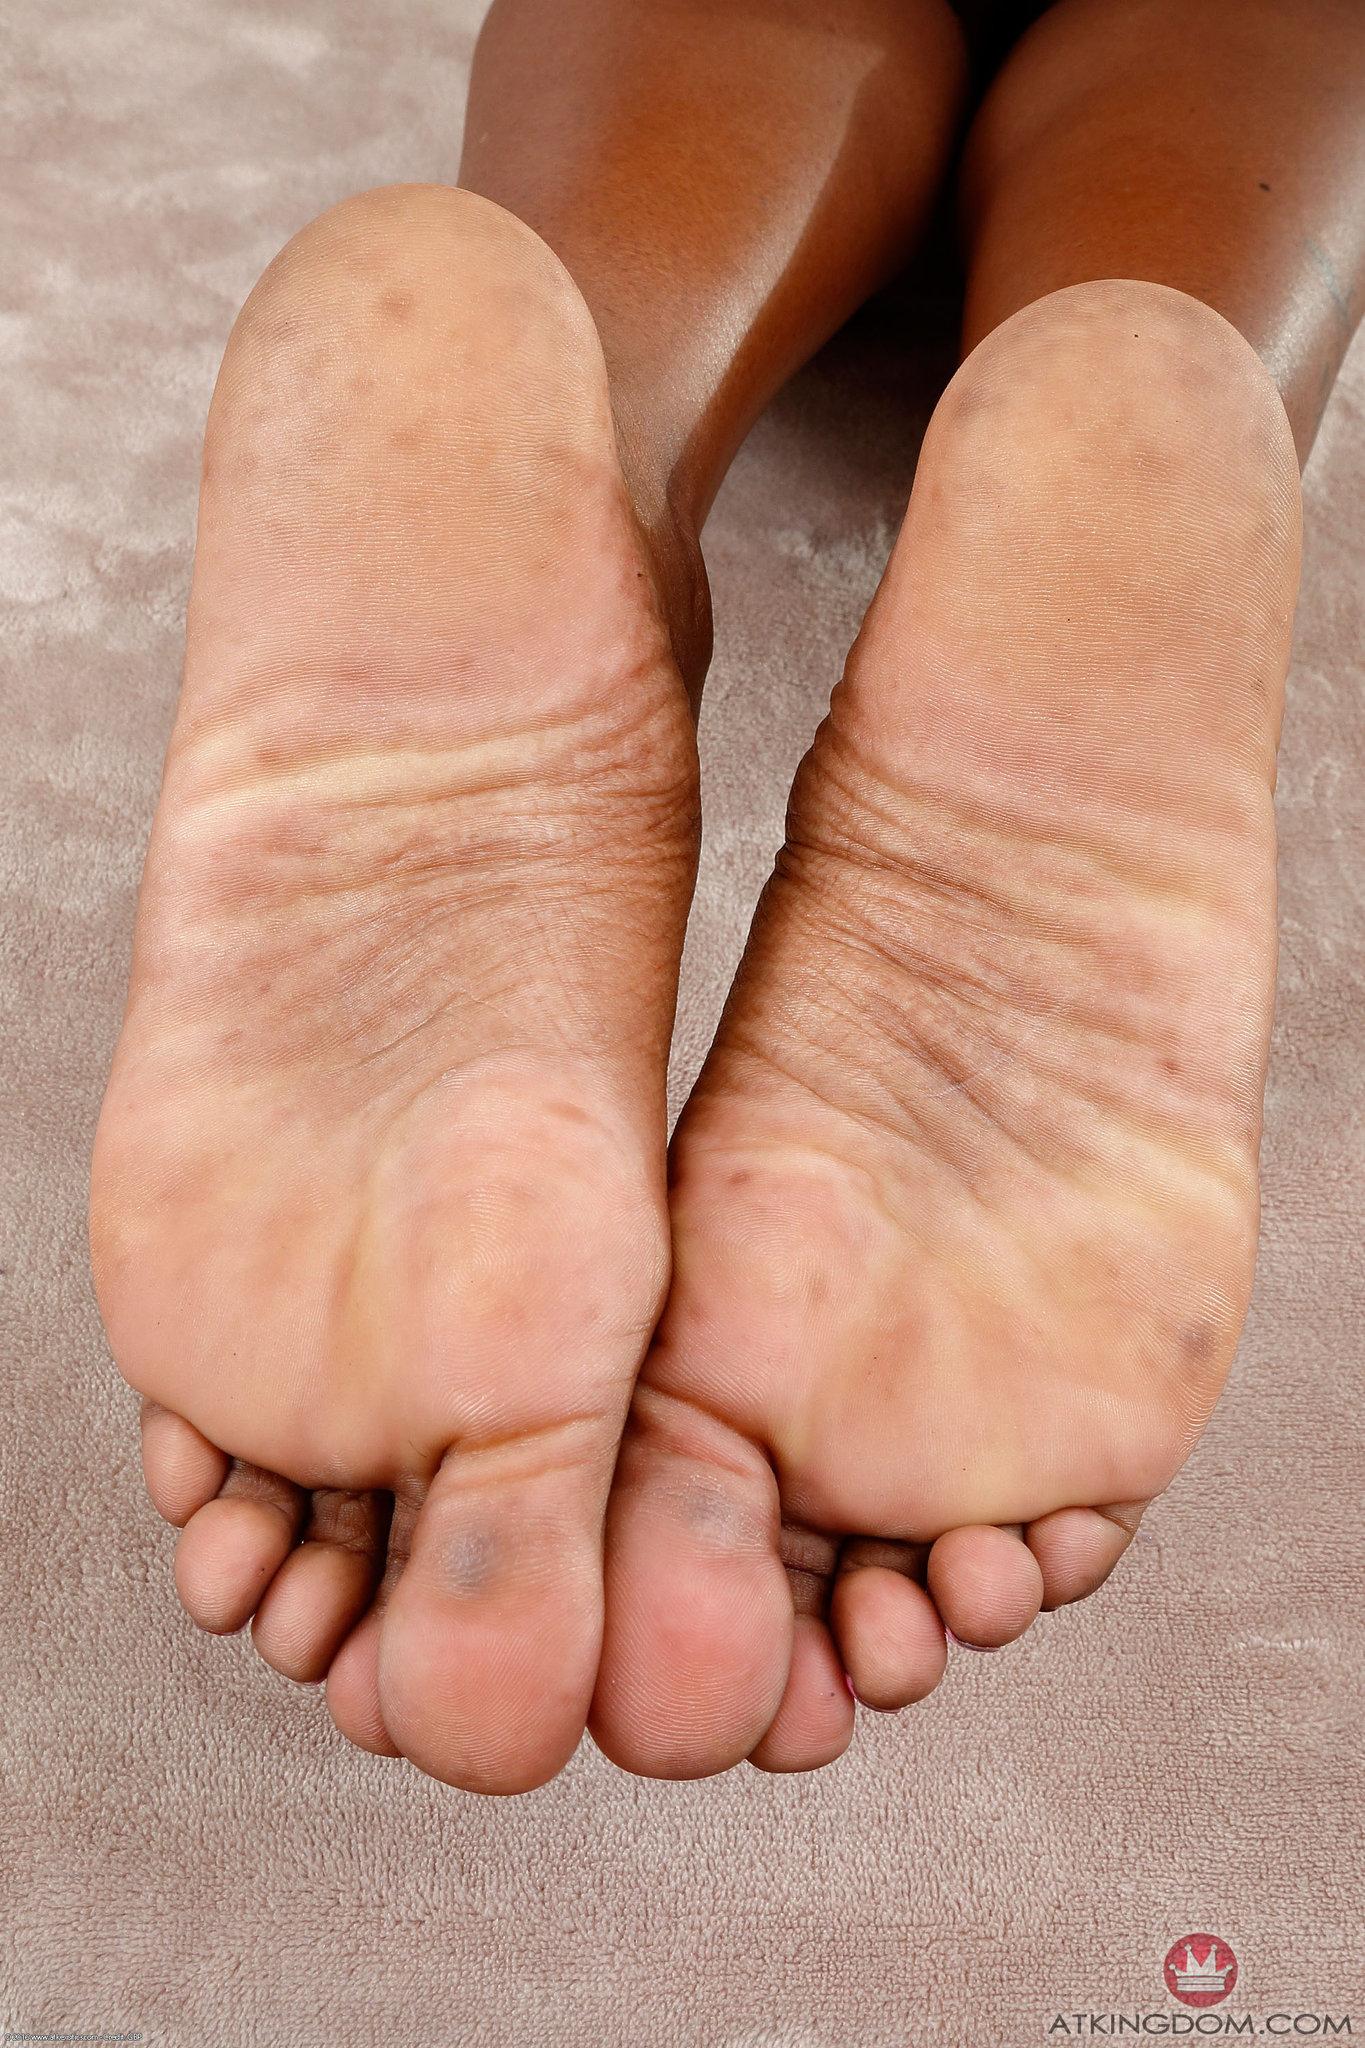 Bella Dahl's feet